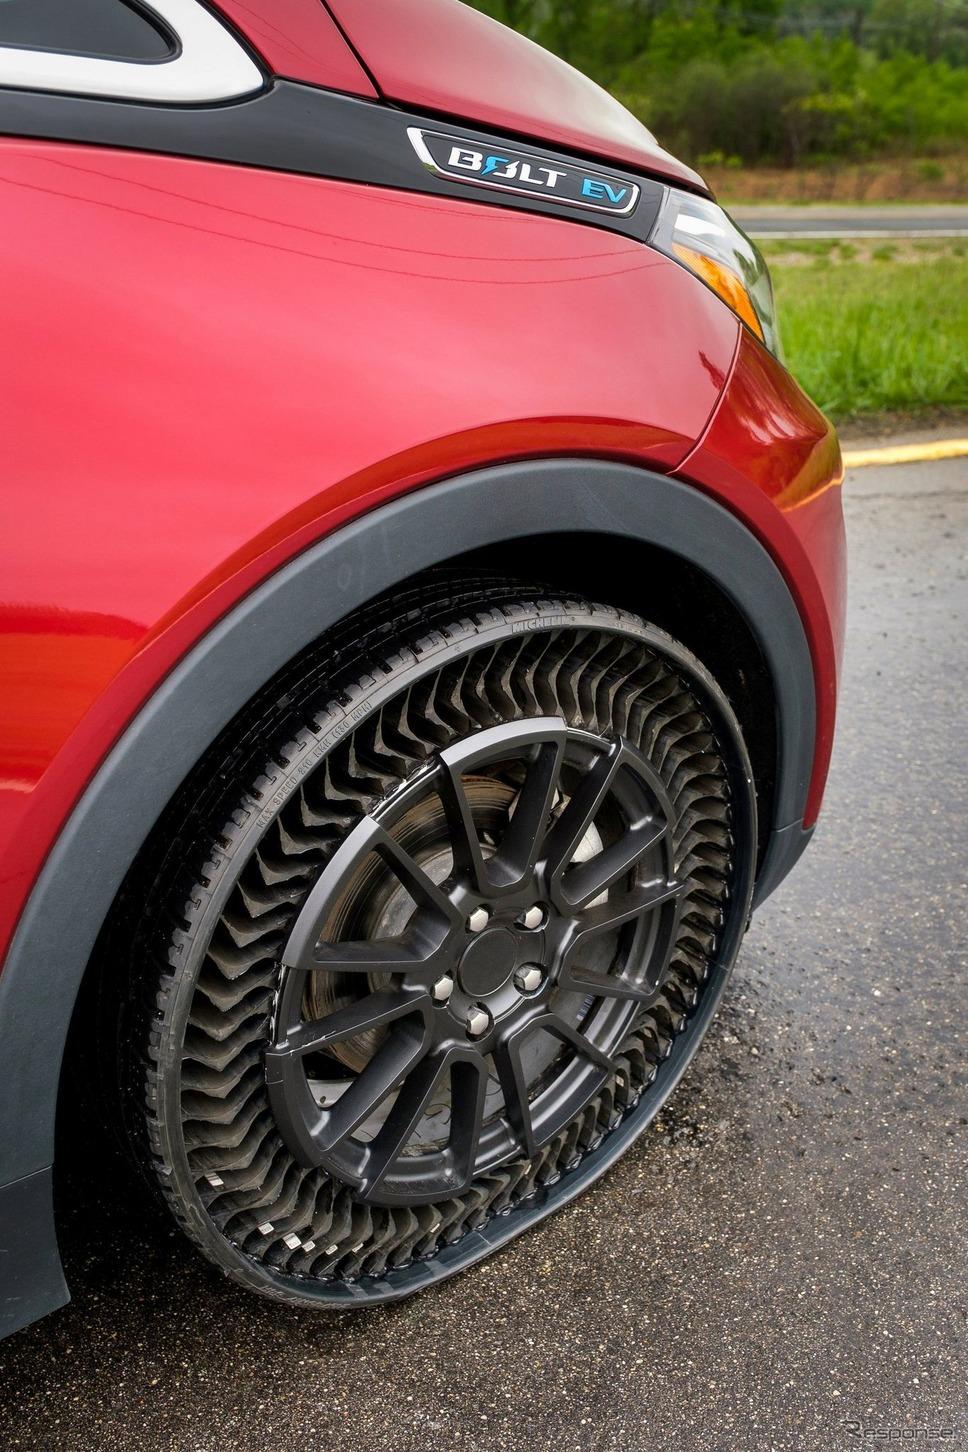 GMとミシュランが共同開発した次世代エアレスタイヤ『アプティス』のプロトタイプ《photo by GM》